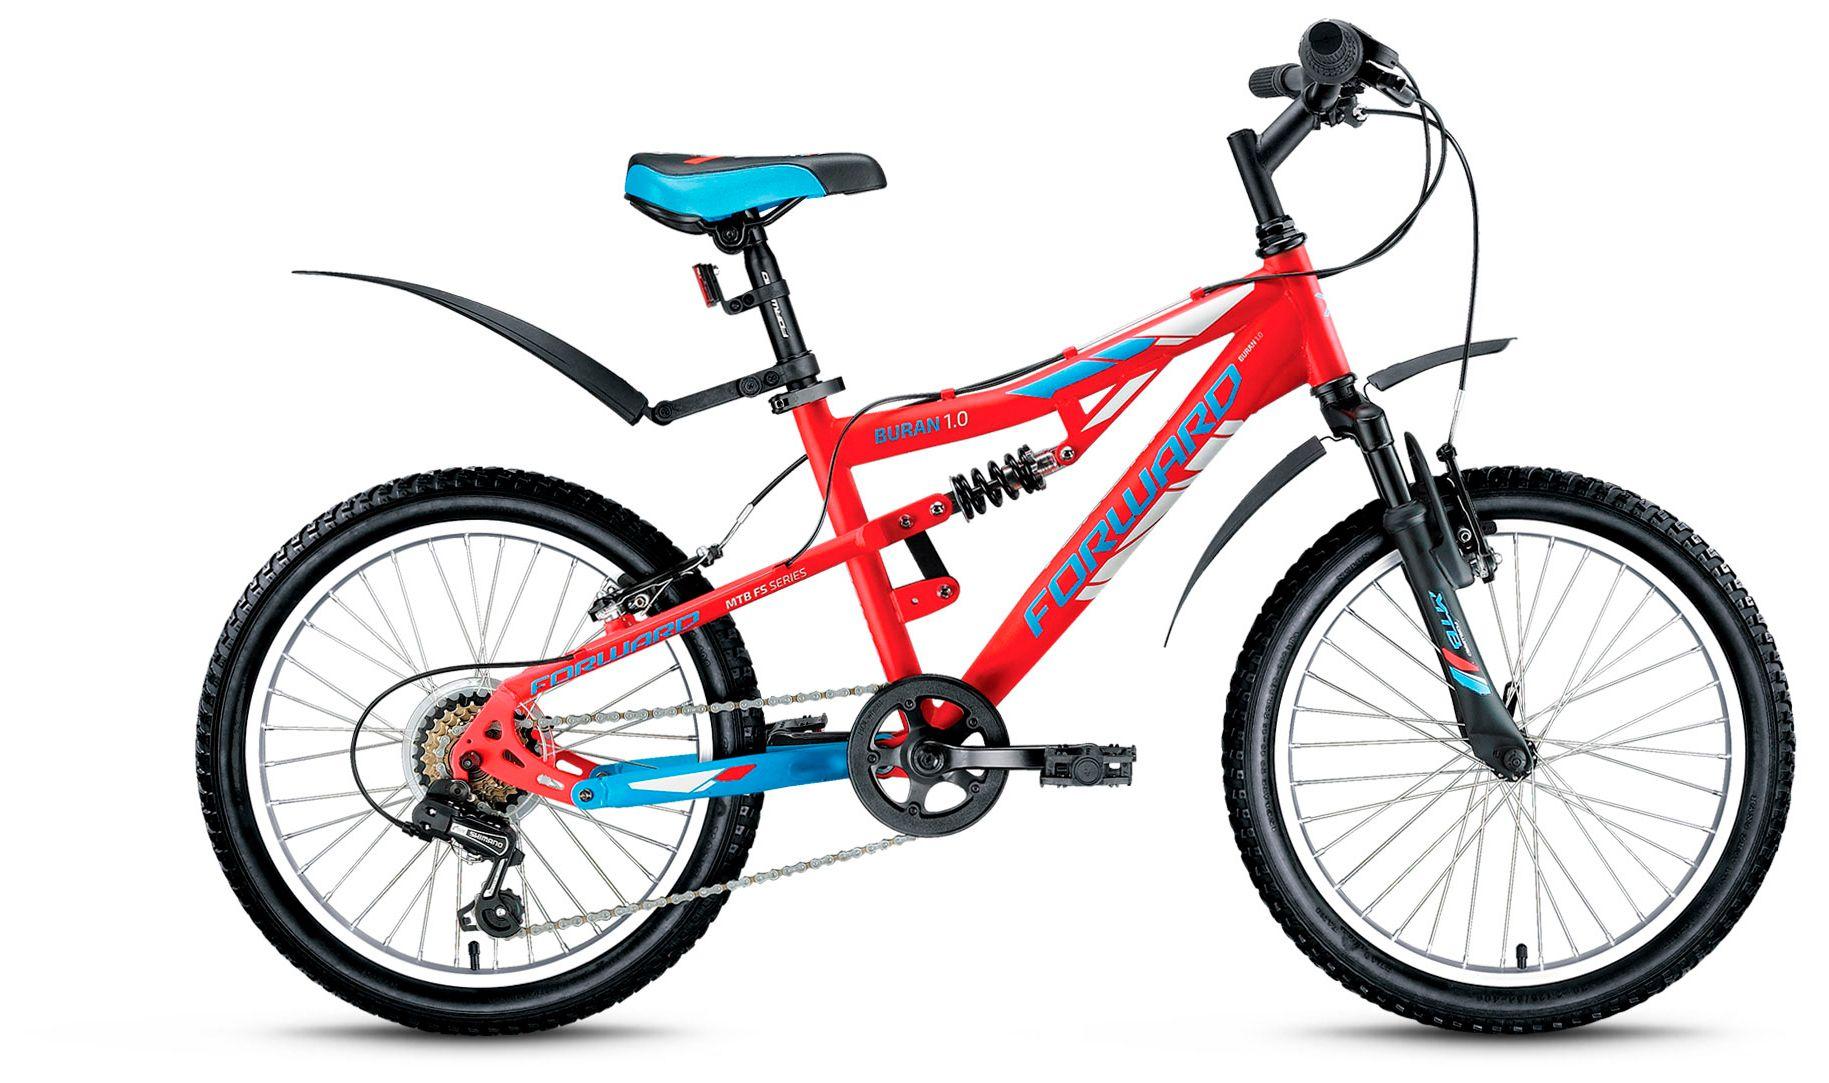 Велосипед Forward Buran 1.0 2017 велосипед forward buran 1 0 13 5 2016 green